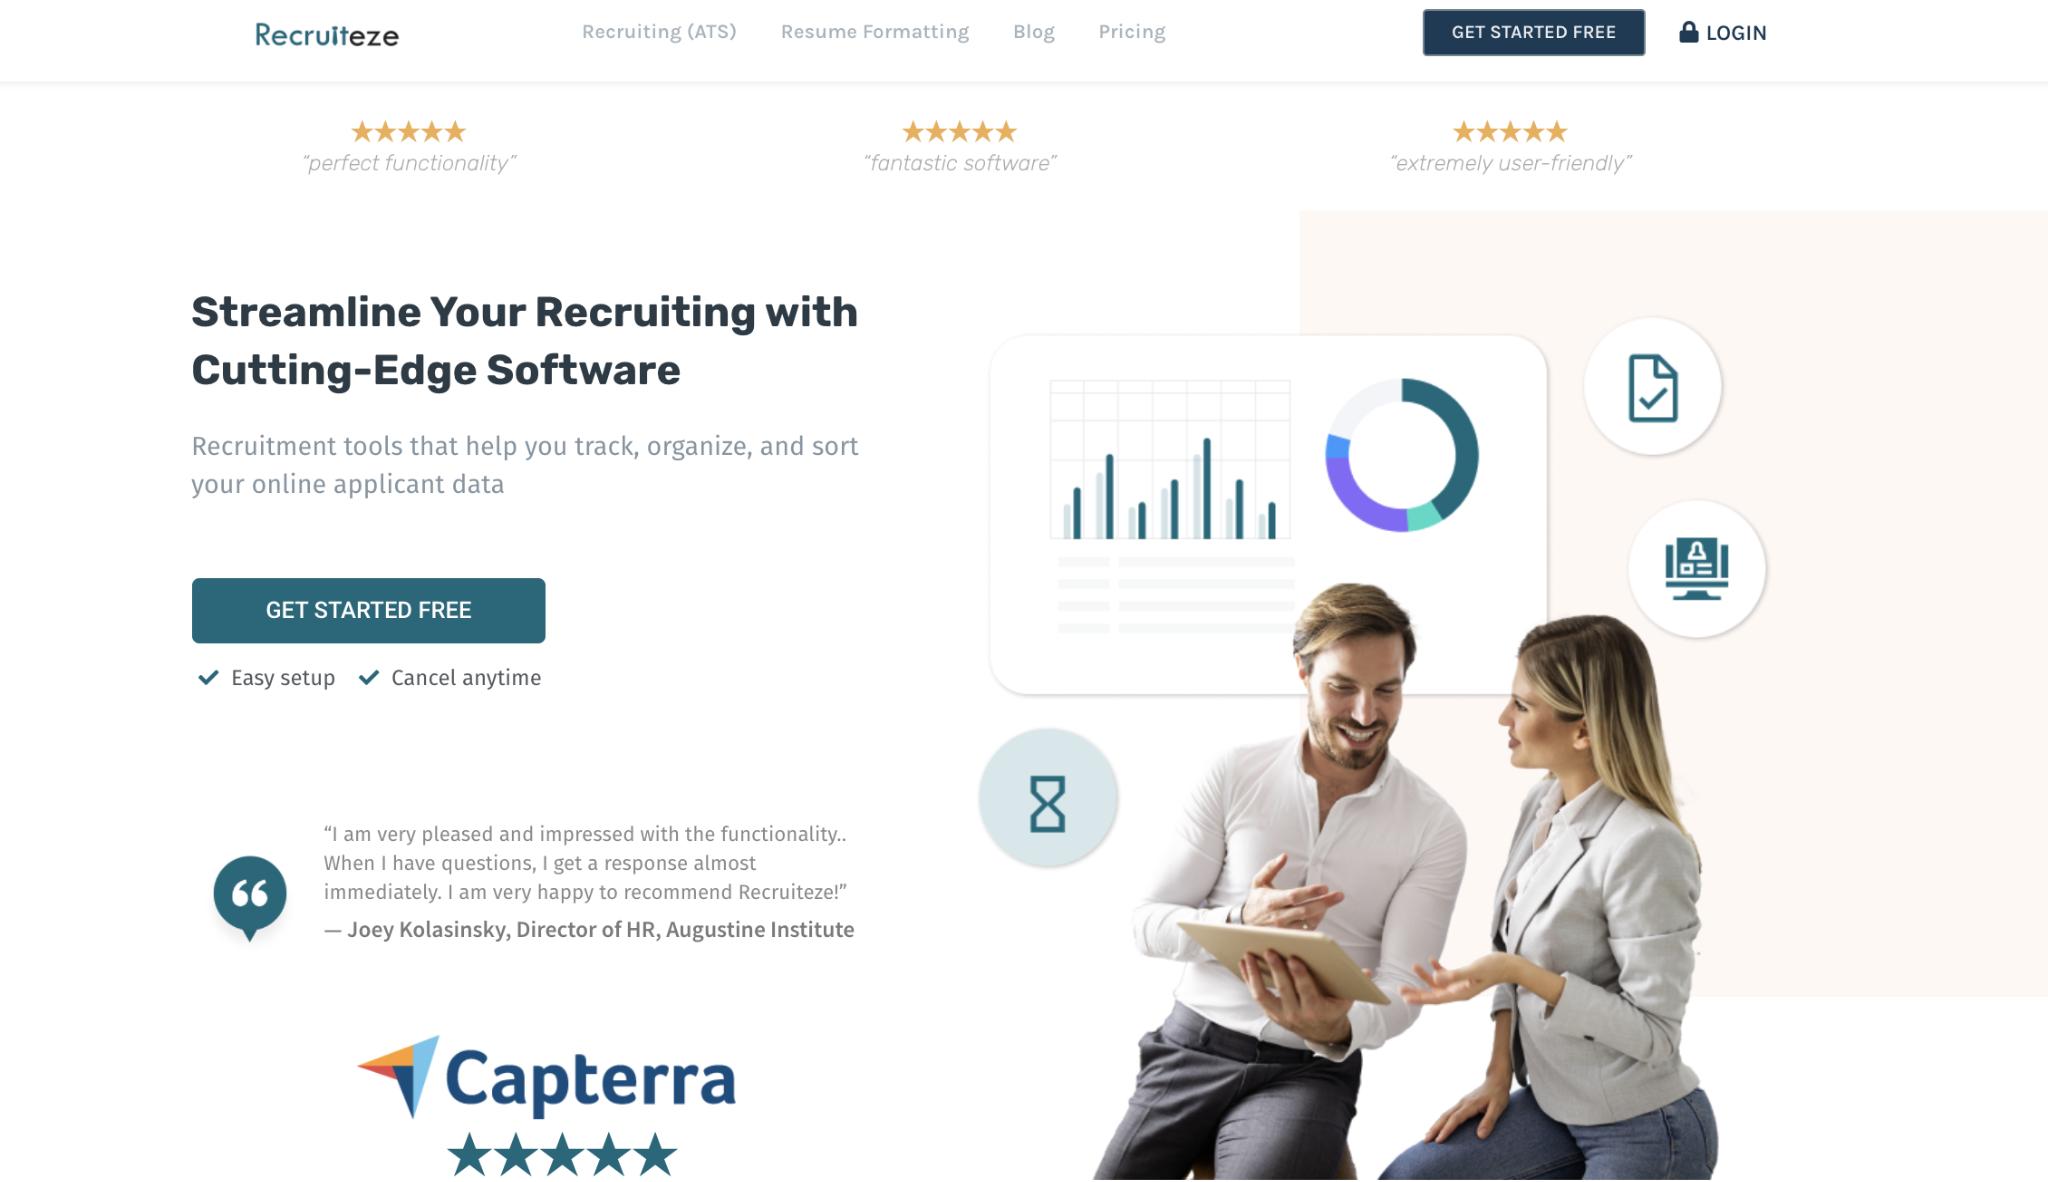 Staffing agency software #1: Recruiteze